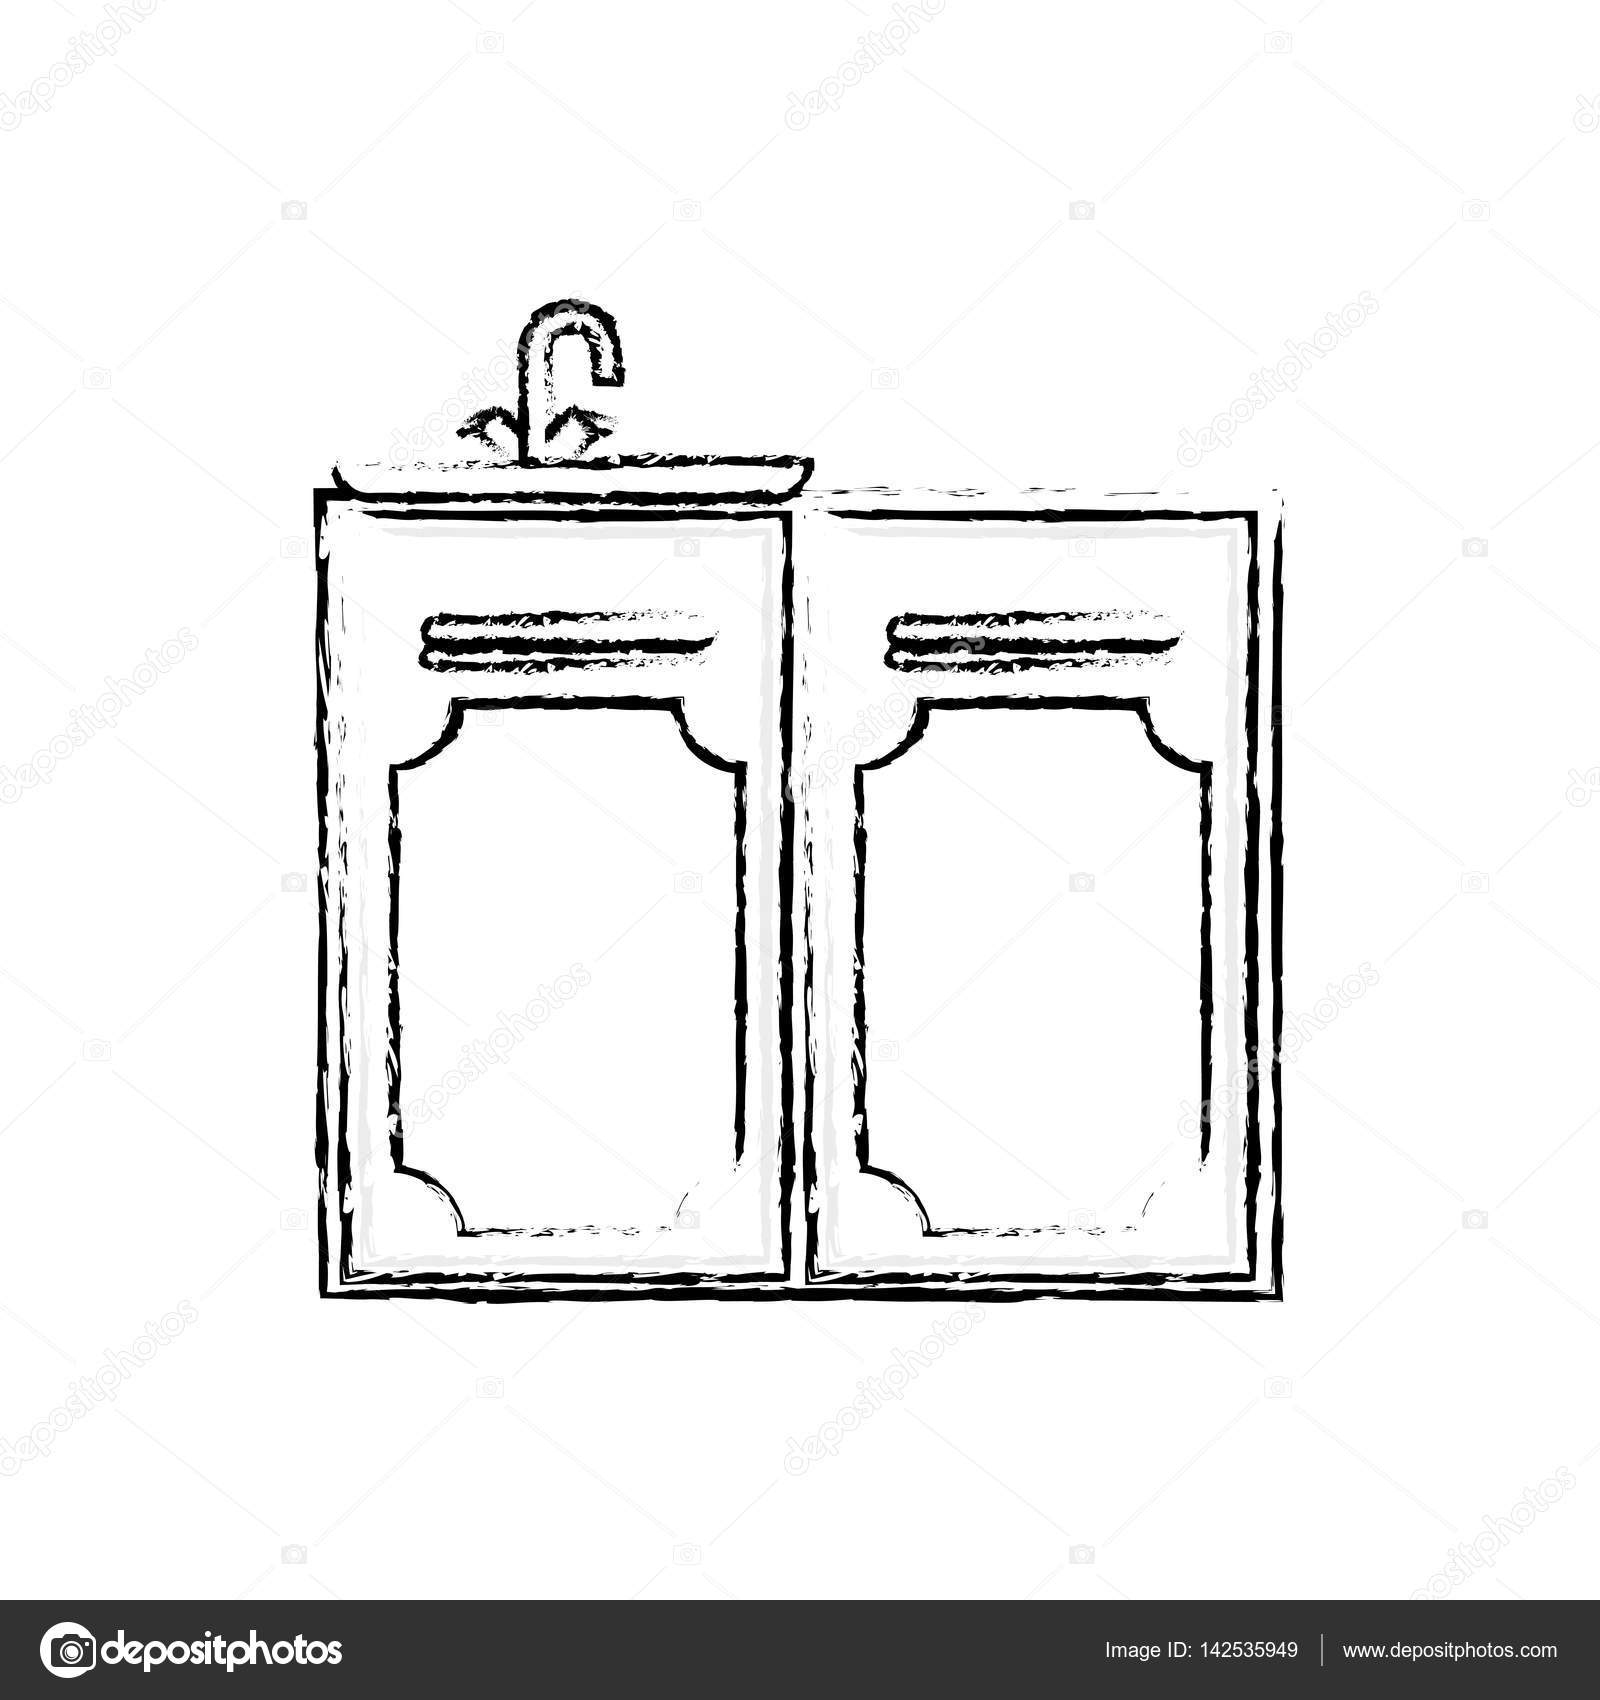 Küchenschrank design — Stockvektor © djv #142535949